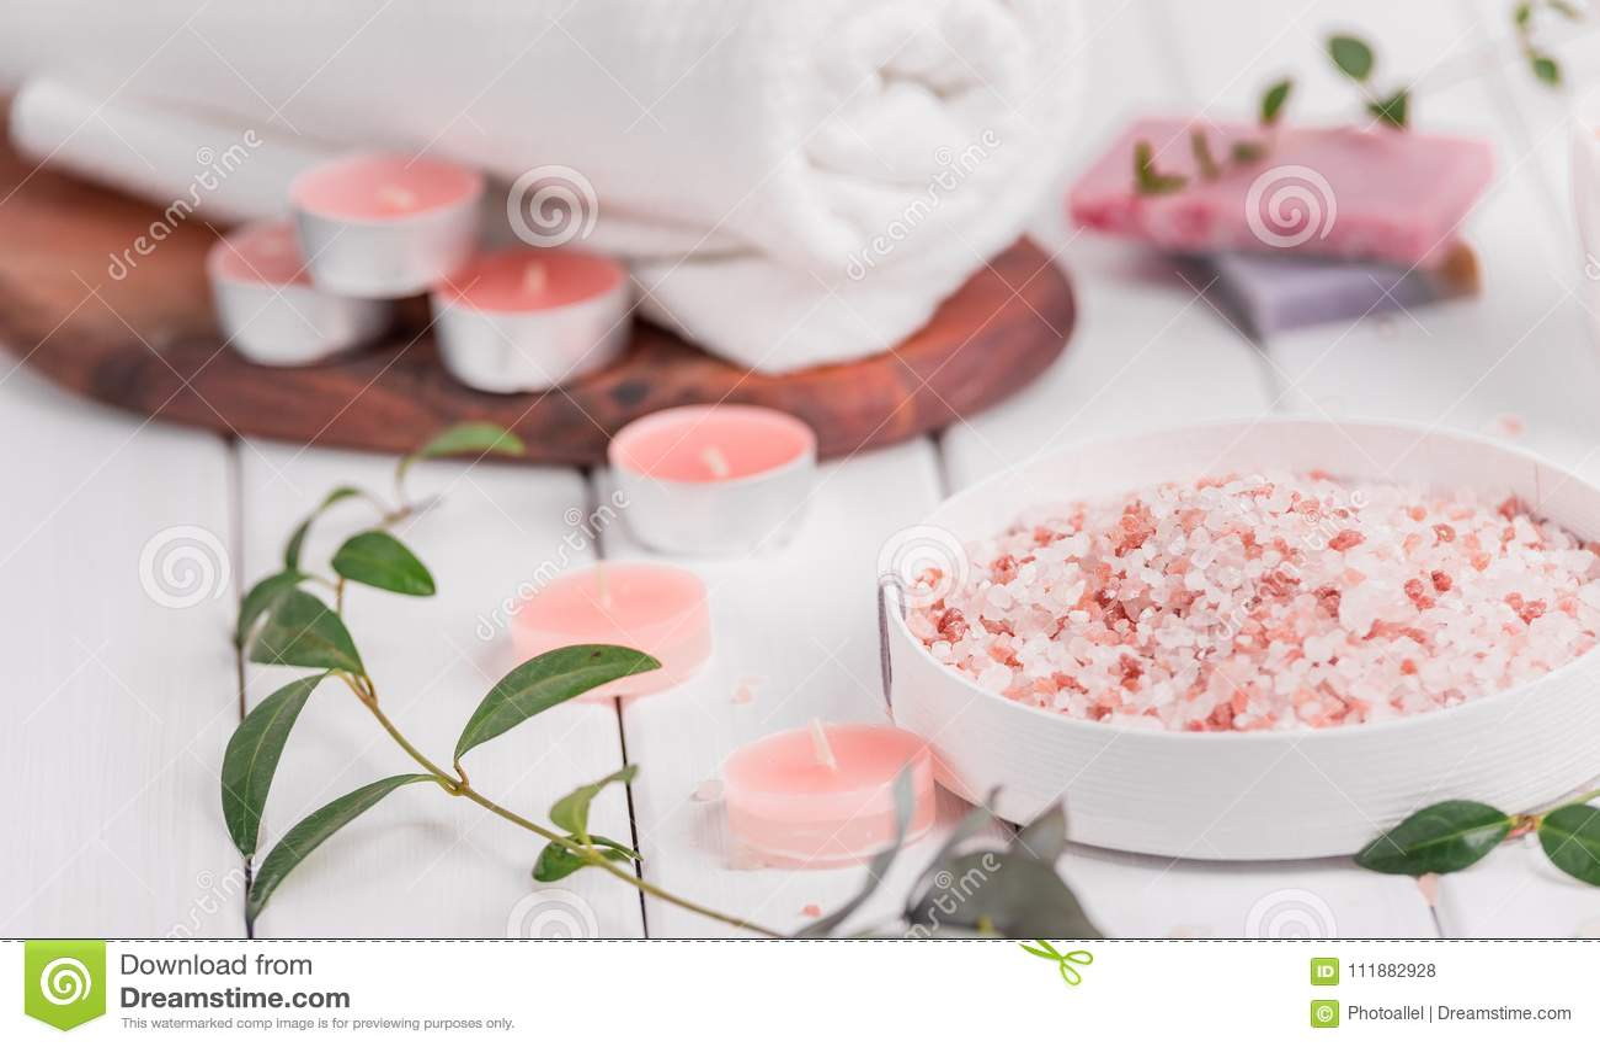 Handmade Salt Peach Scrub With Argan Oil  Himalayan Salt